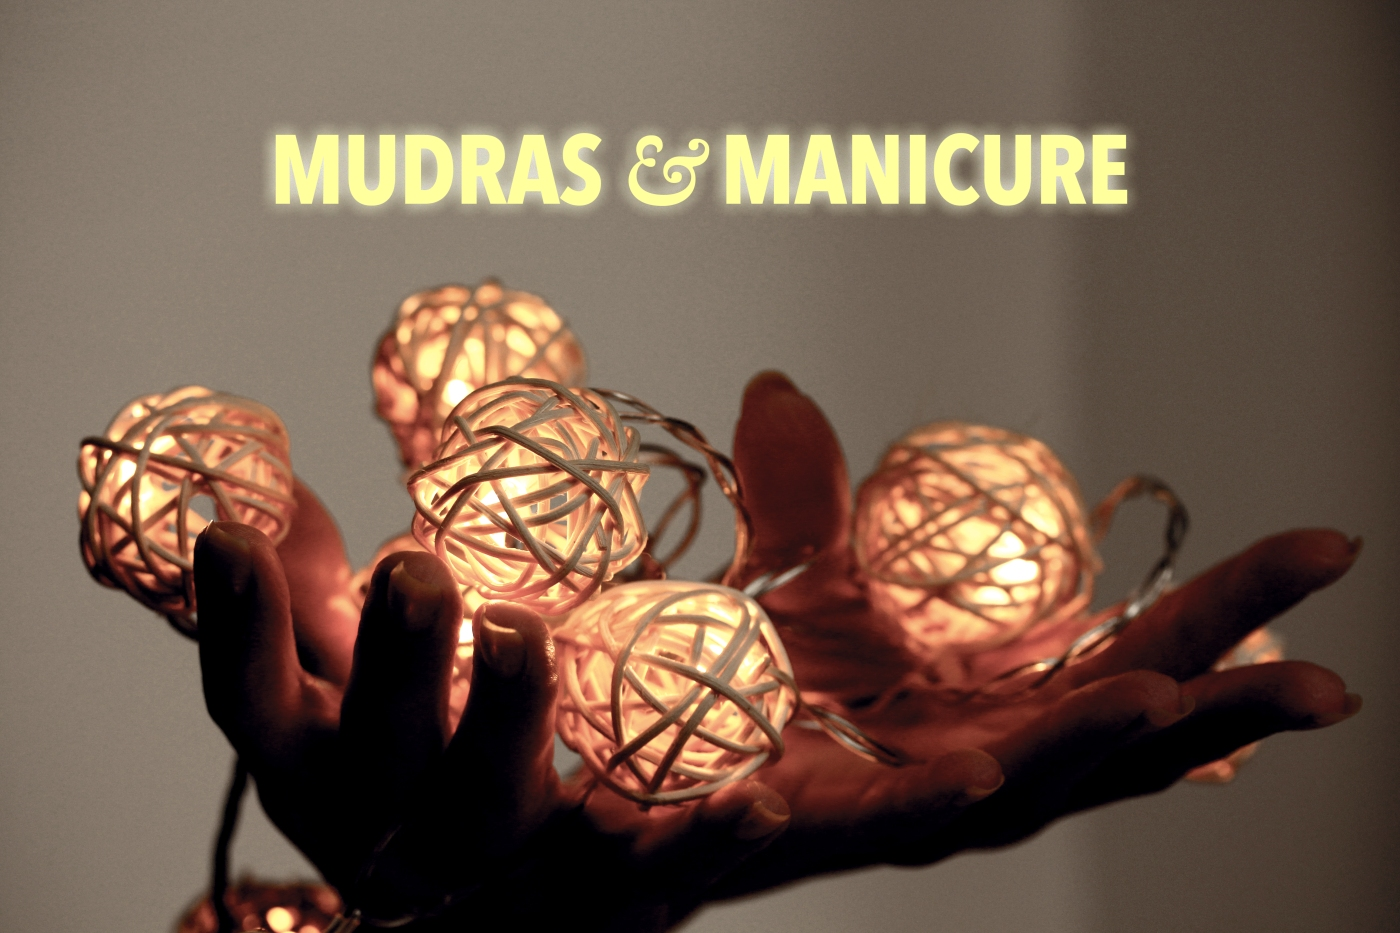 Mudras-and-Manicure-beautycalypse-series